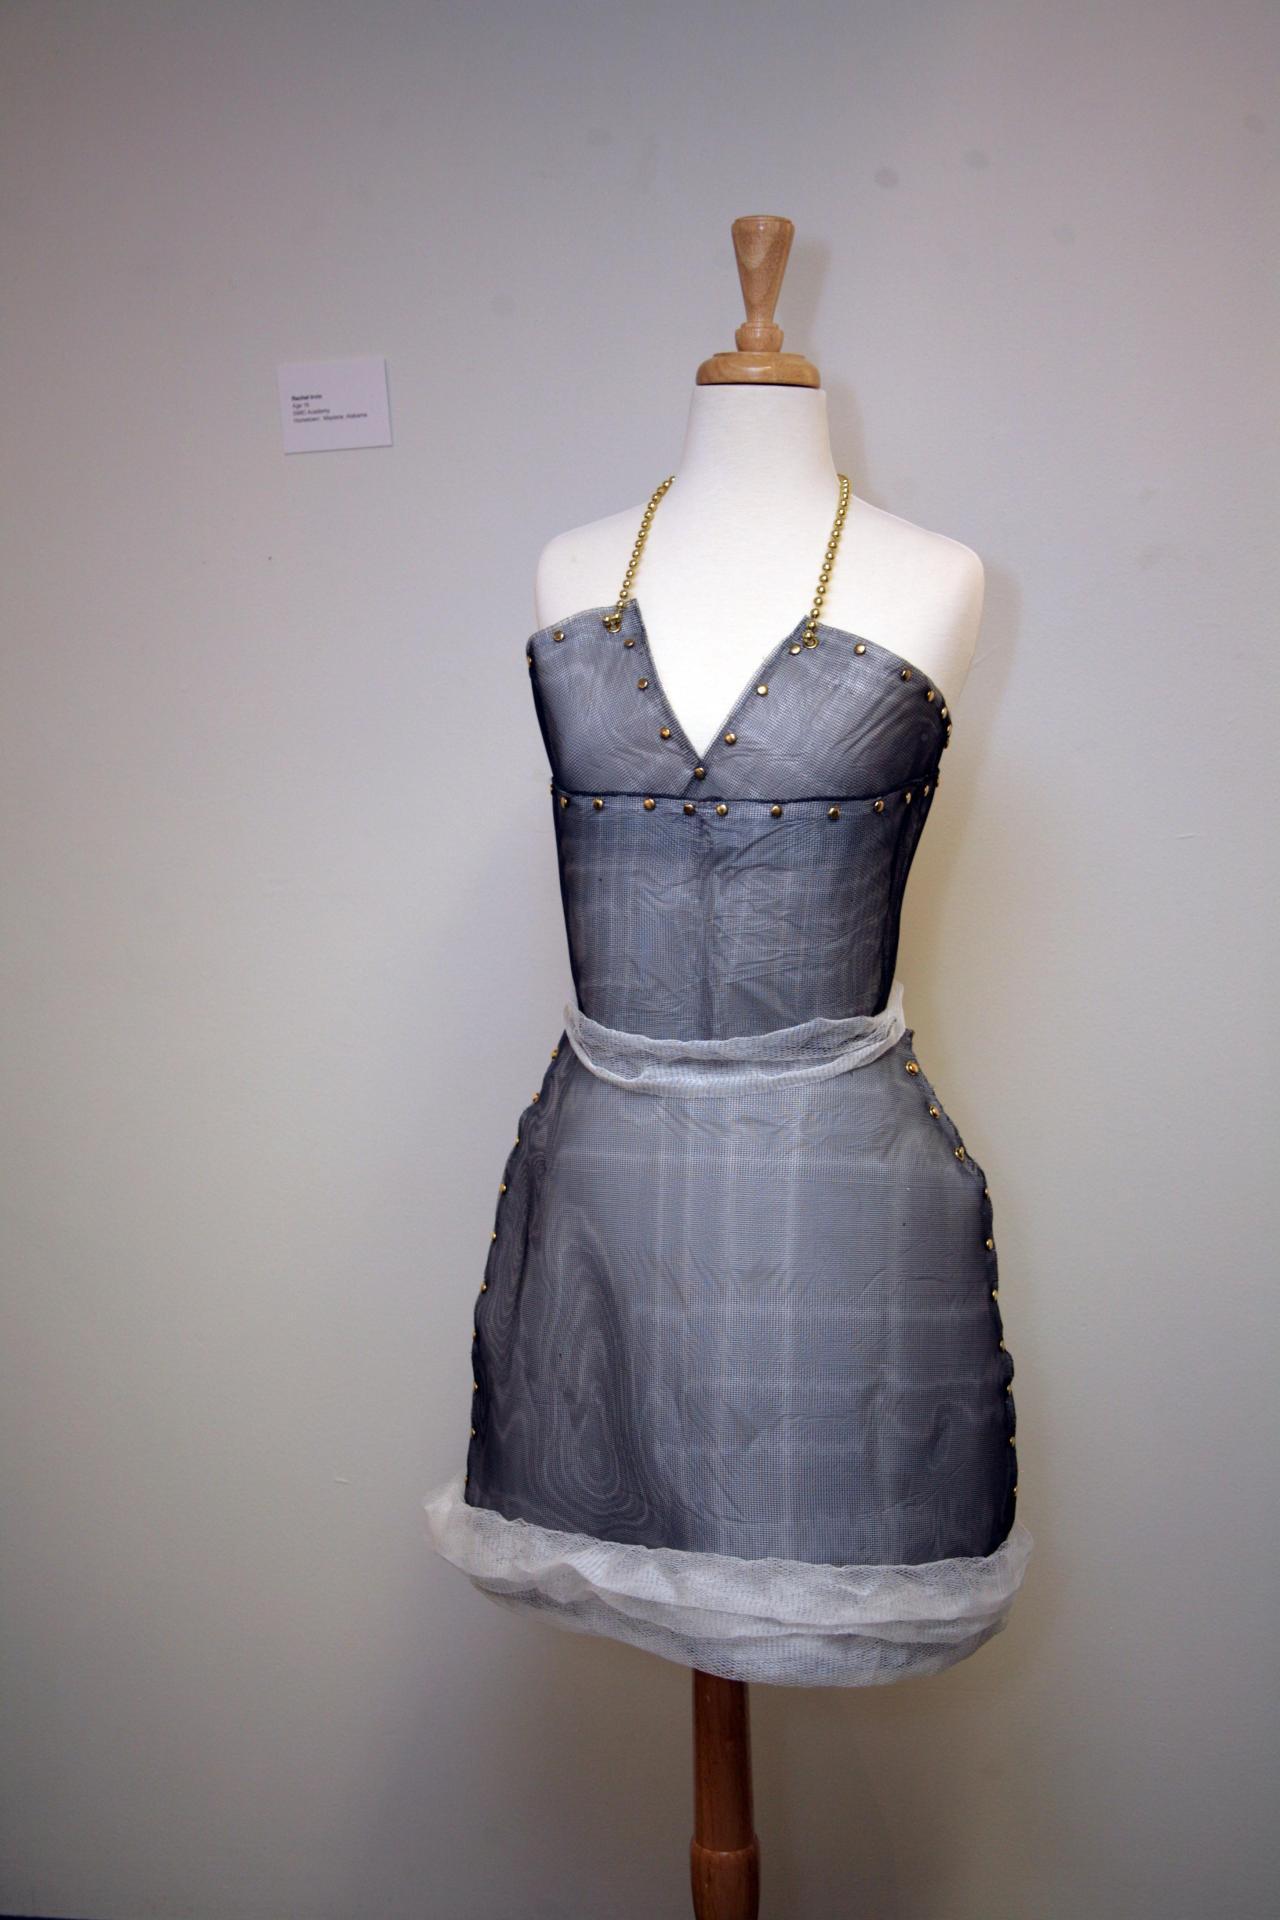 Rachel Irvin of SMIC Academy created this sleek silver dress. I love the fabulous neckline!